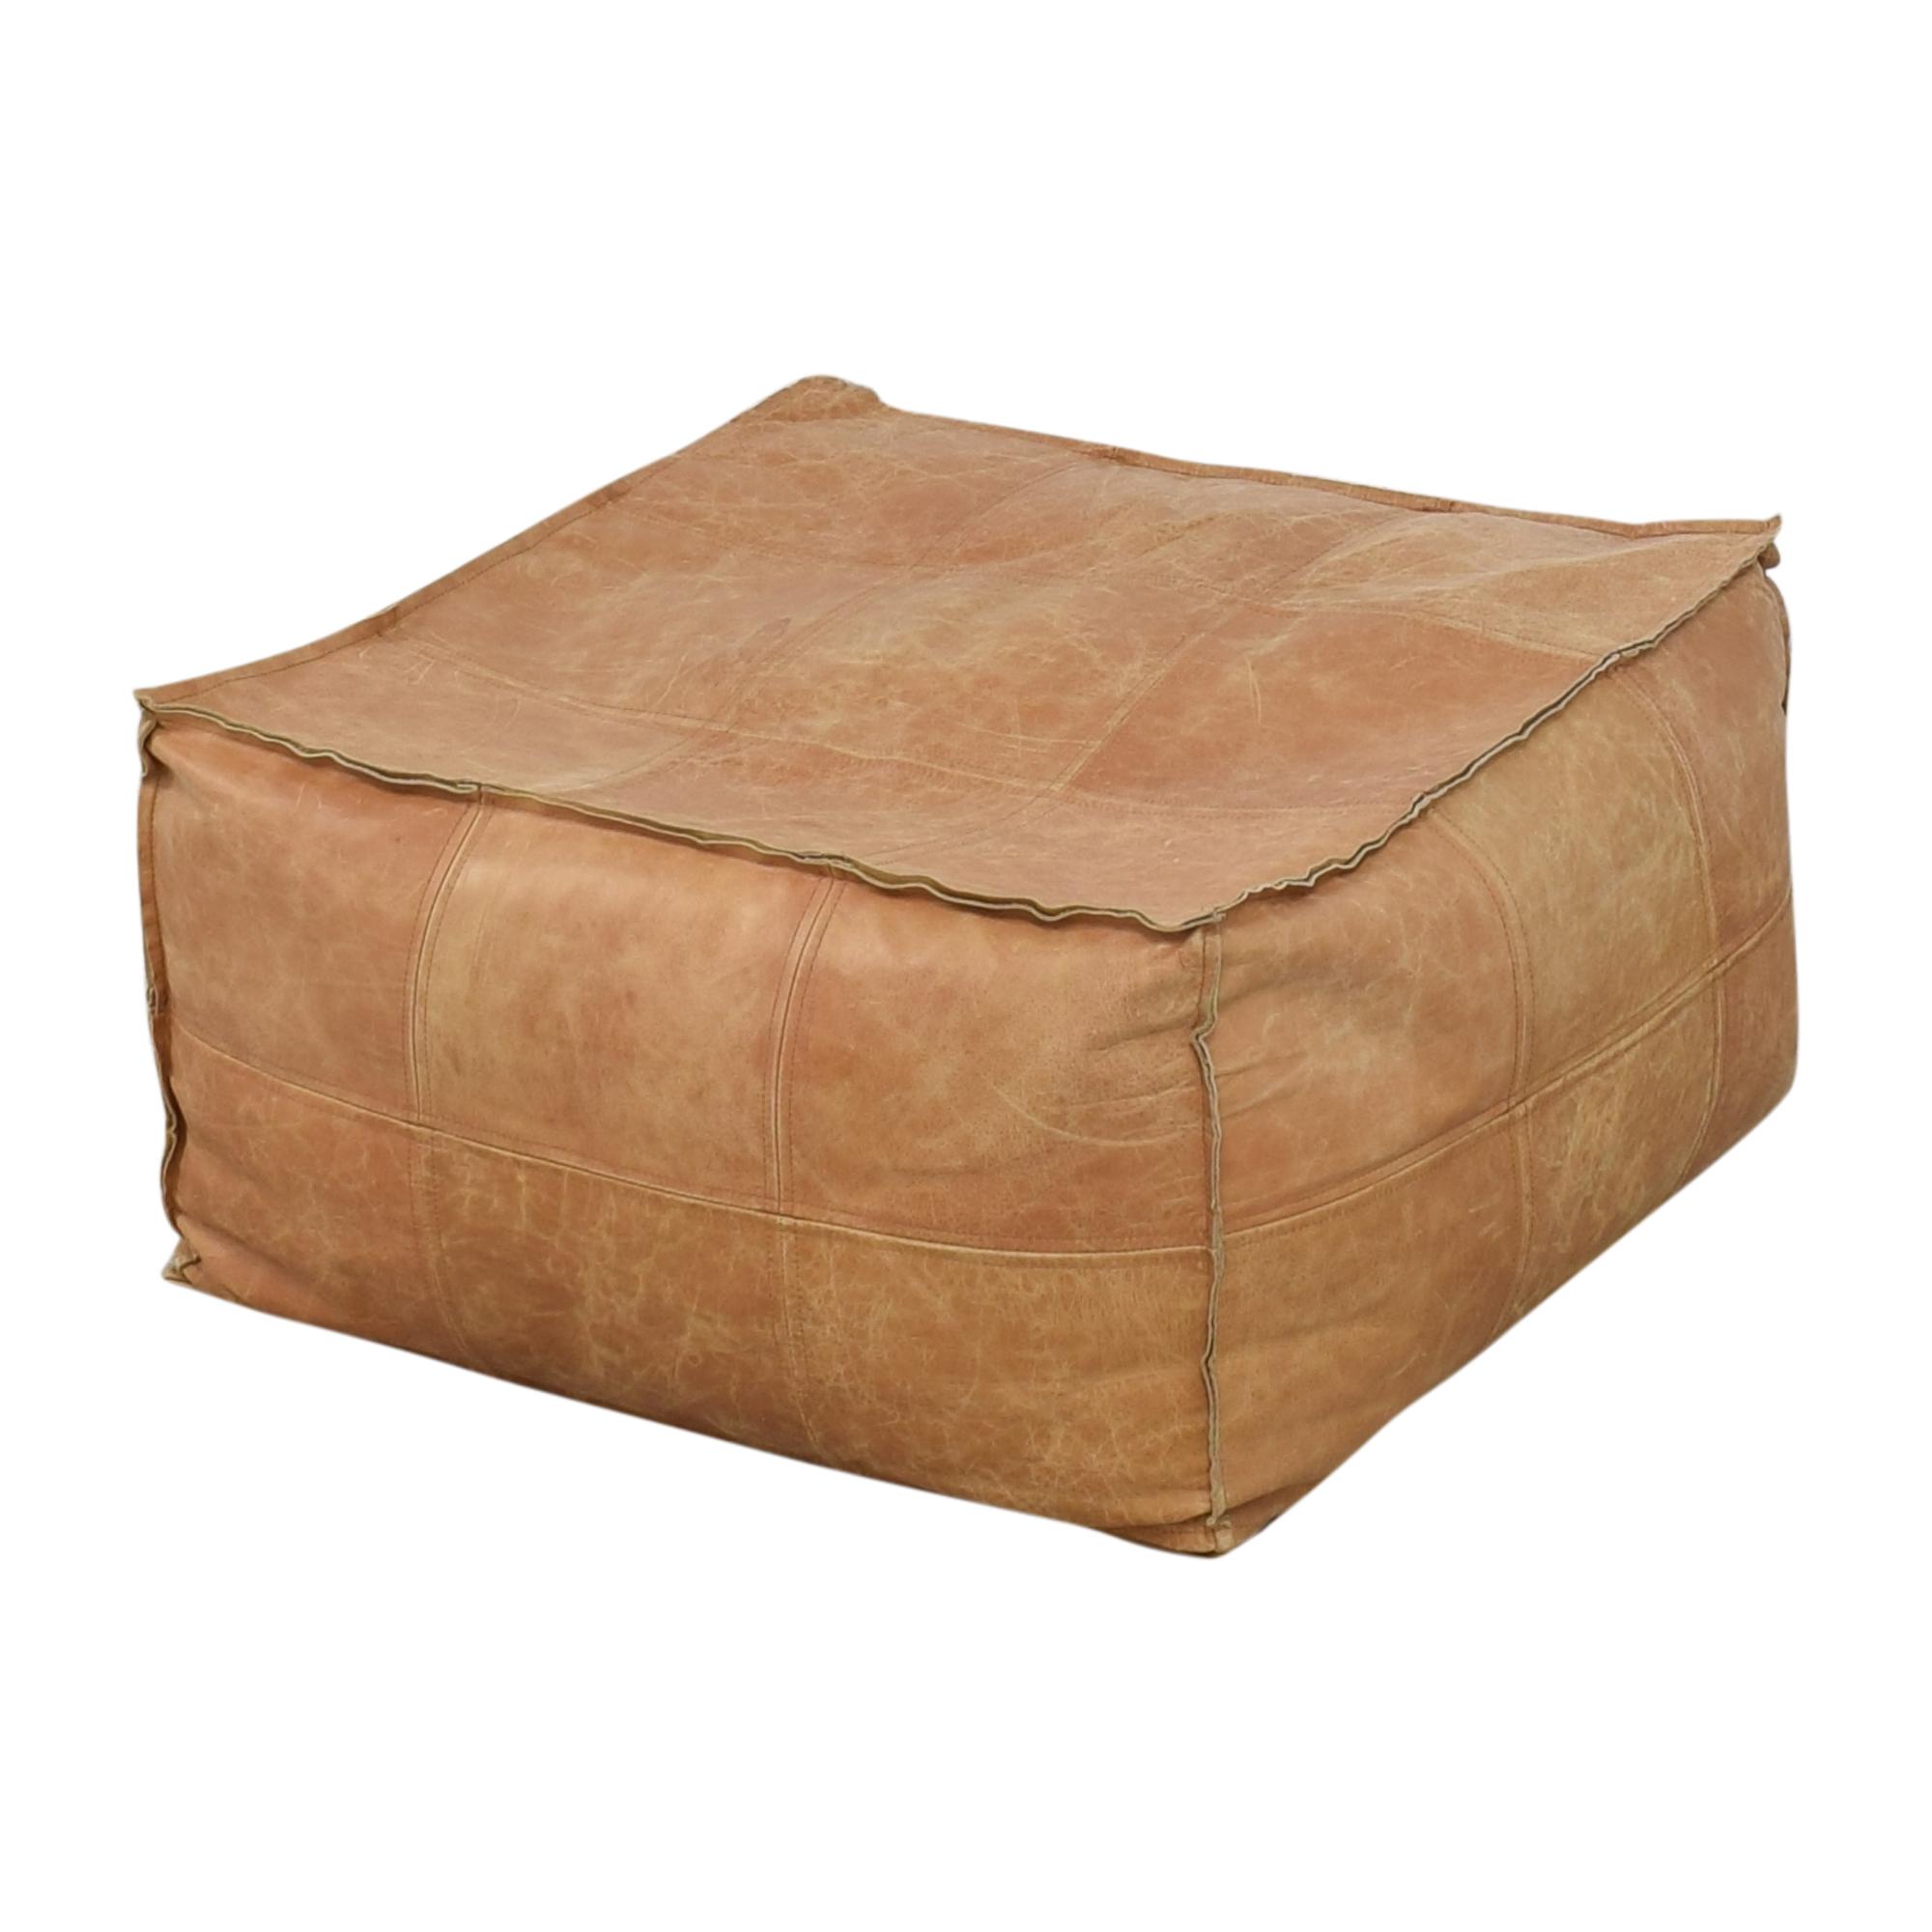 buy CB2 Medium Square Leather Ottoman Pouf CB2